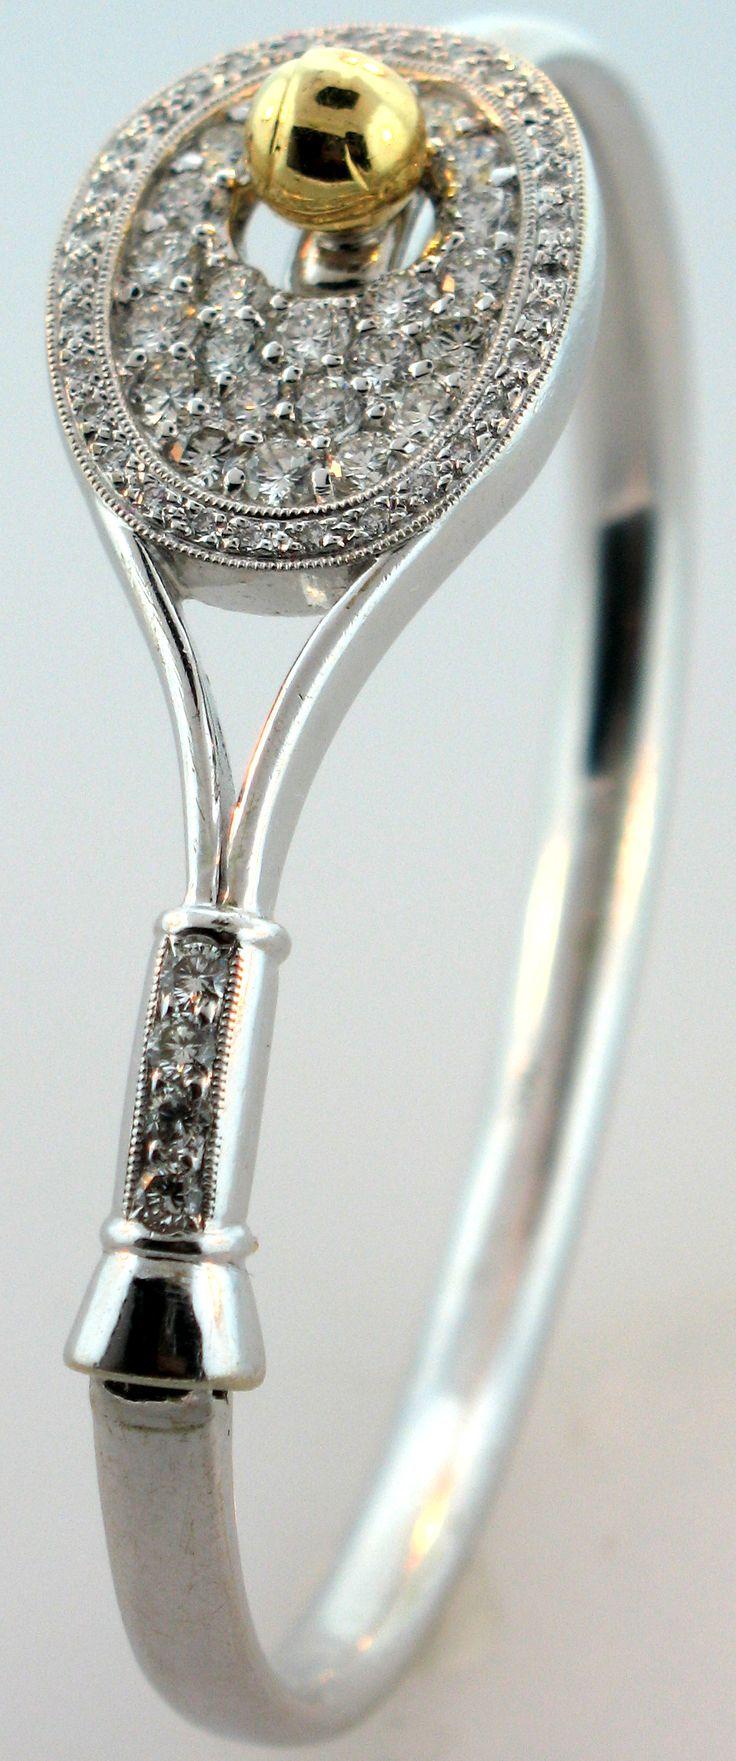 #Valentines Day idea! Diamond Tennis Racket bracelet .  #tennis #ausopen  www.australianopen.com